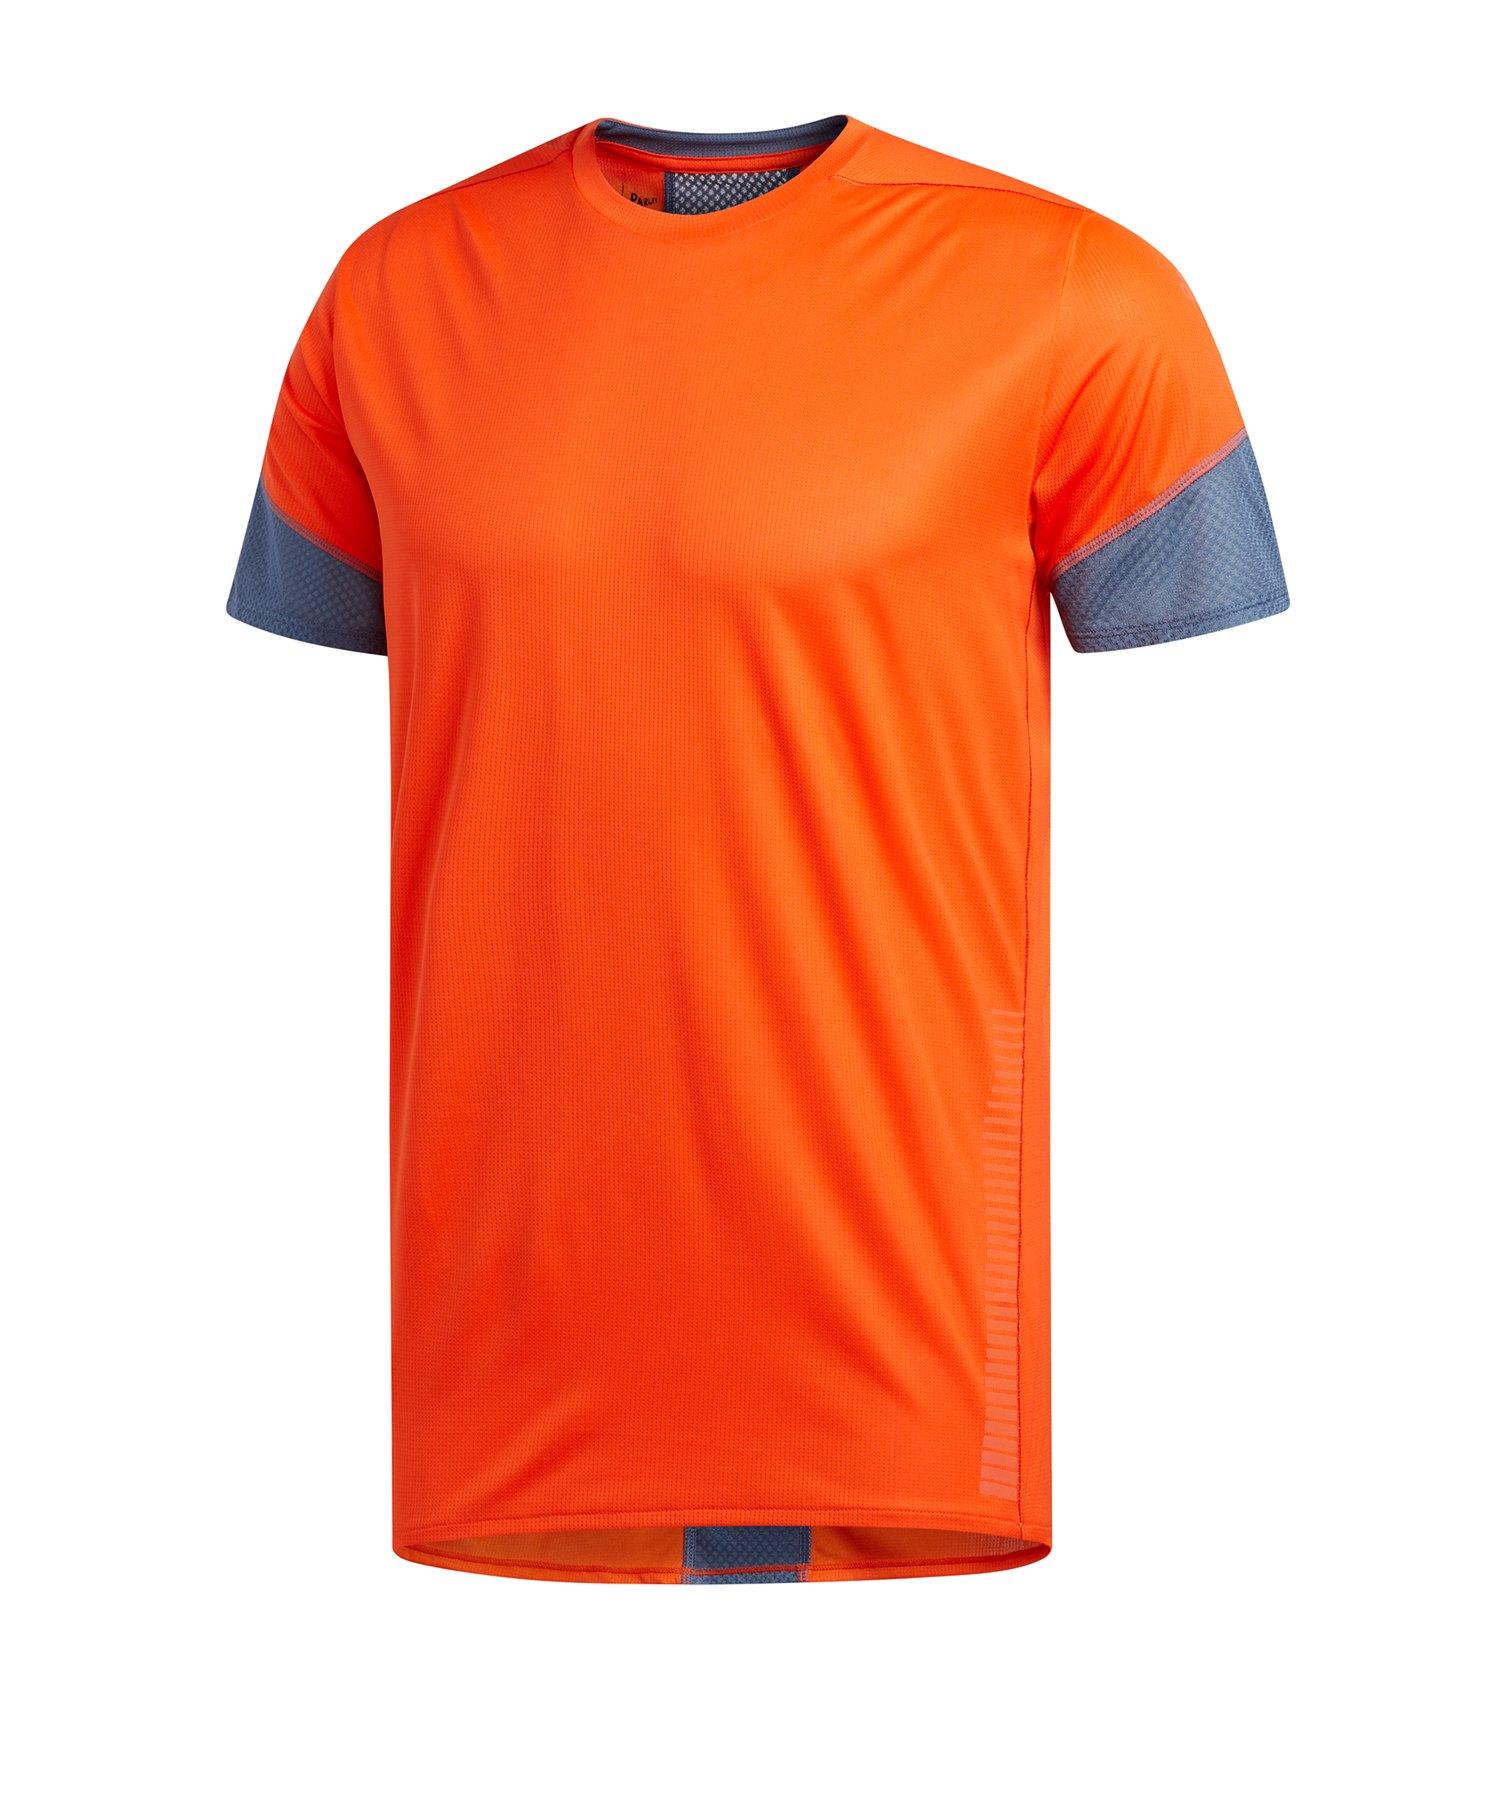 adidas 25/7 Tee T-Shirt Running Orange - orange